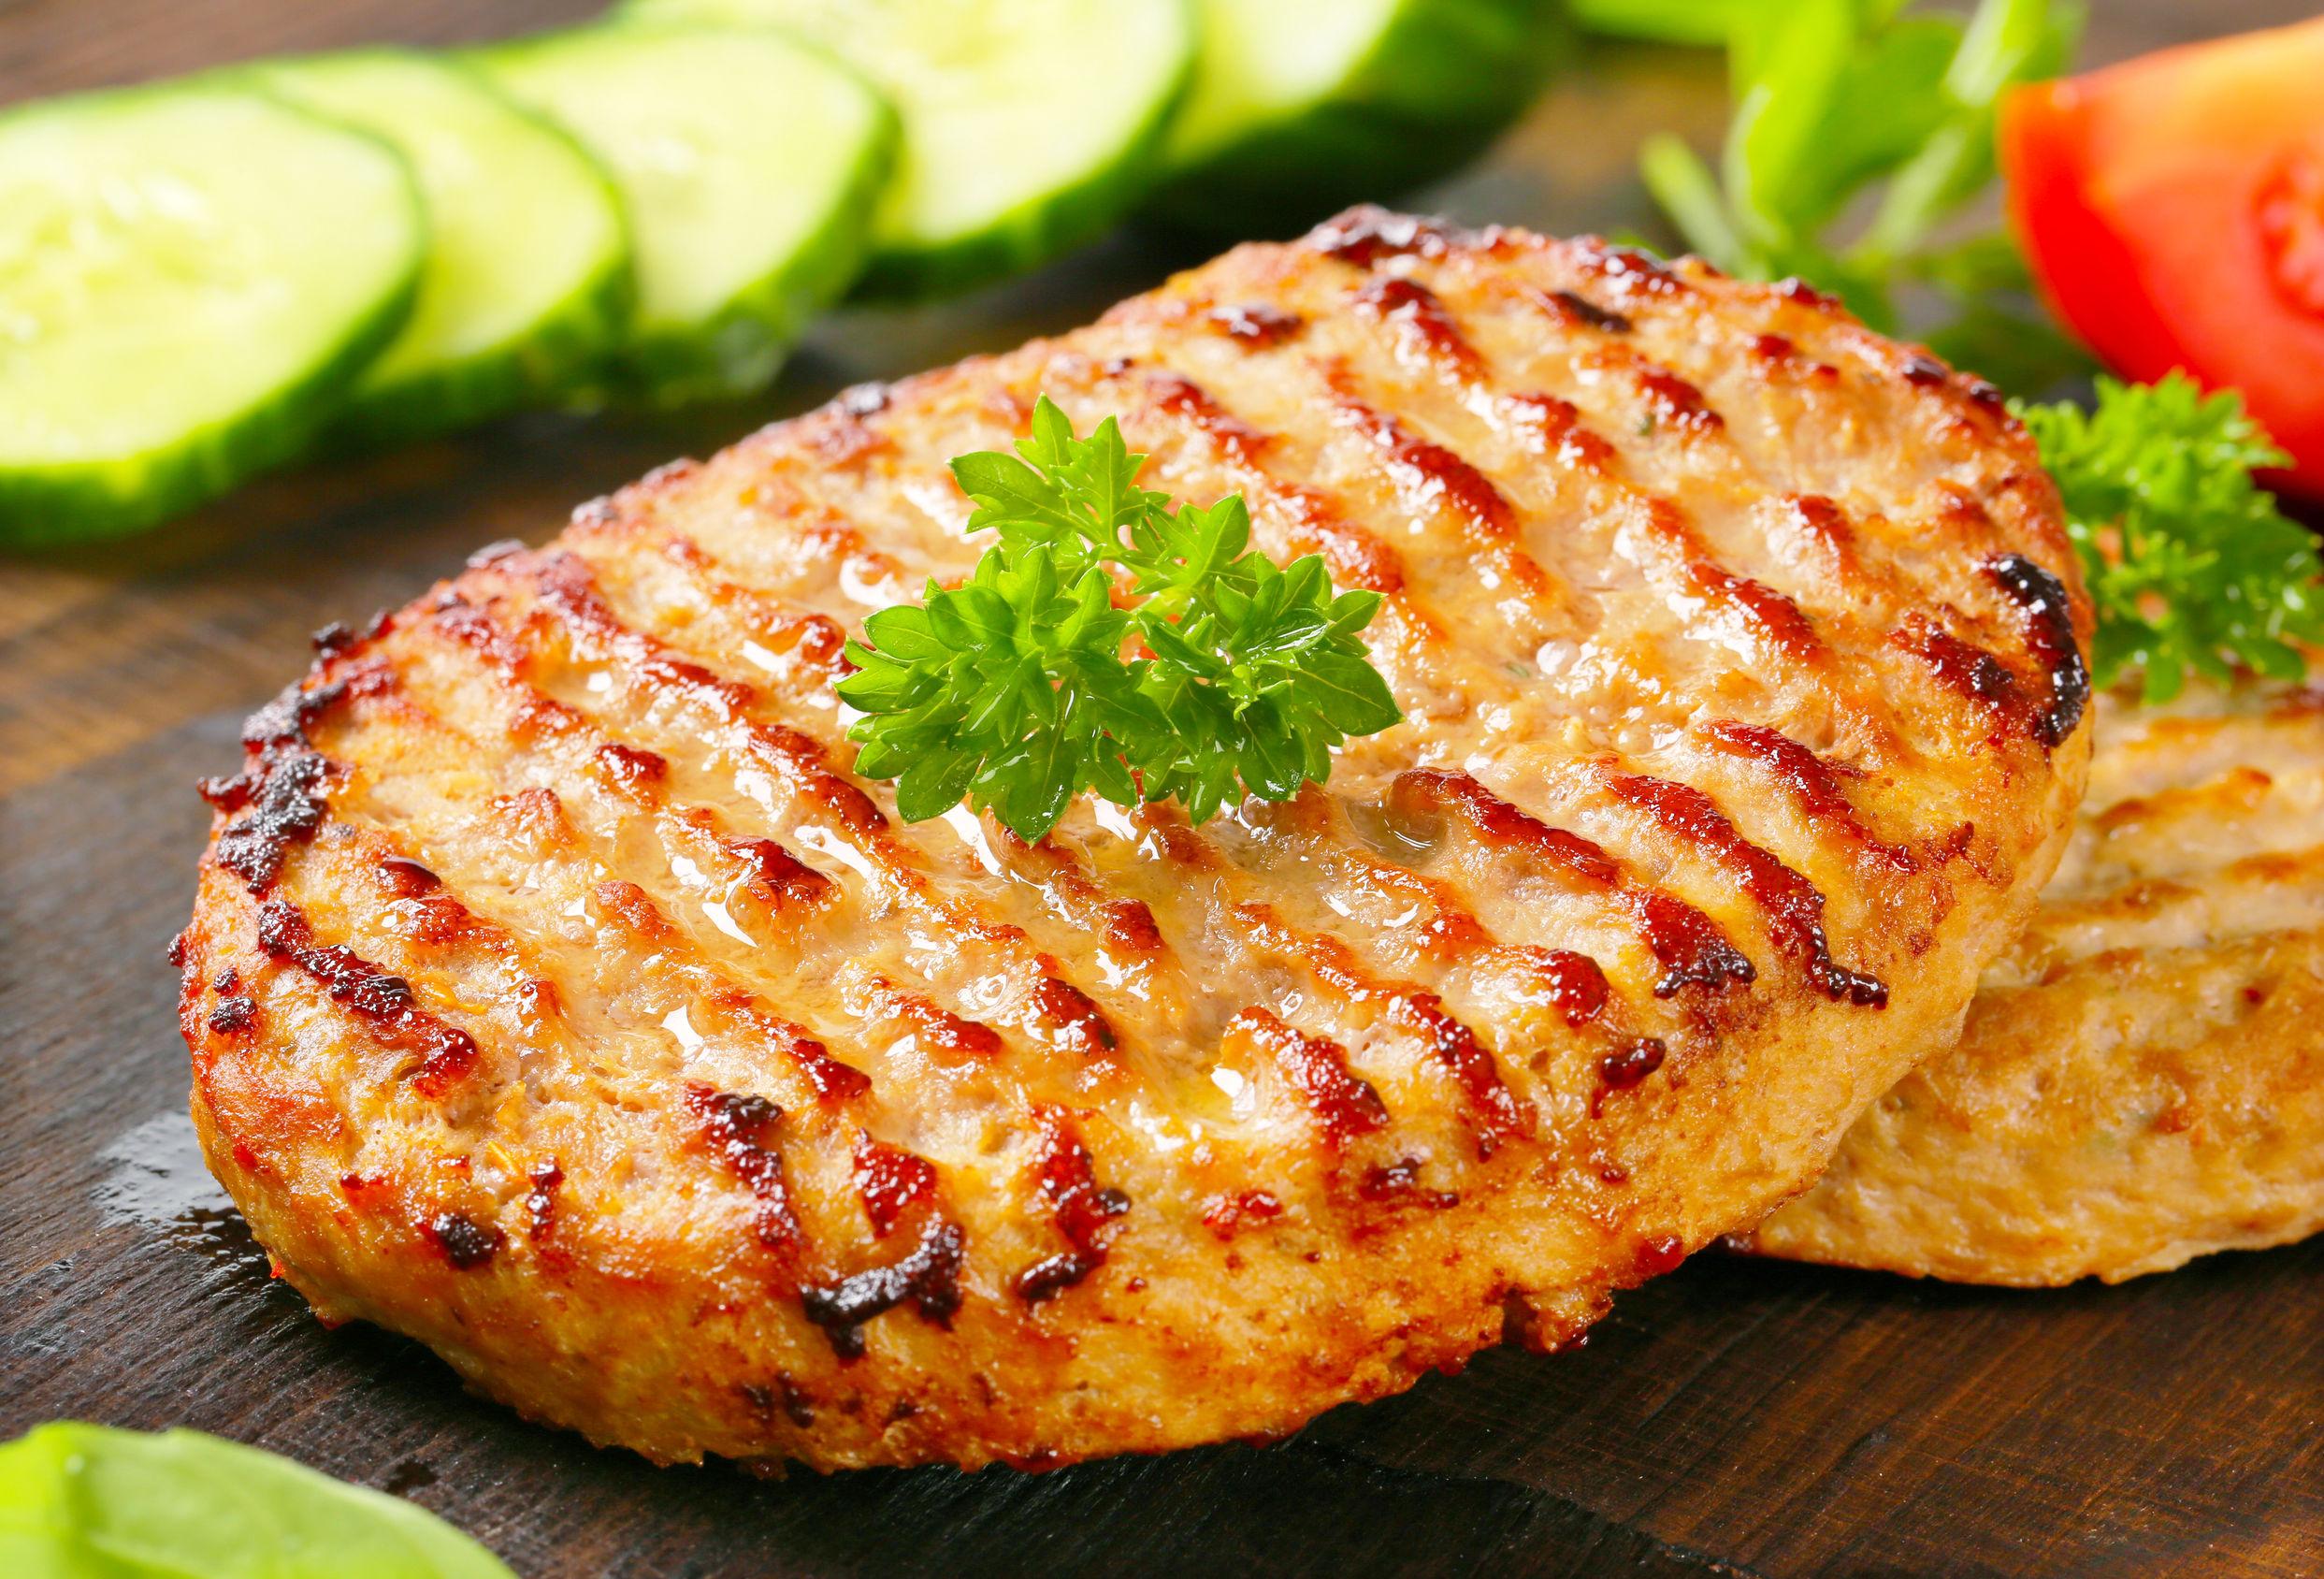 Receta de hamburguesas veganas de okara